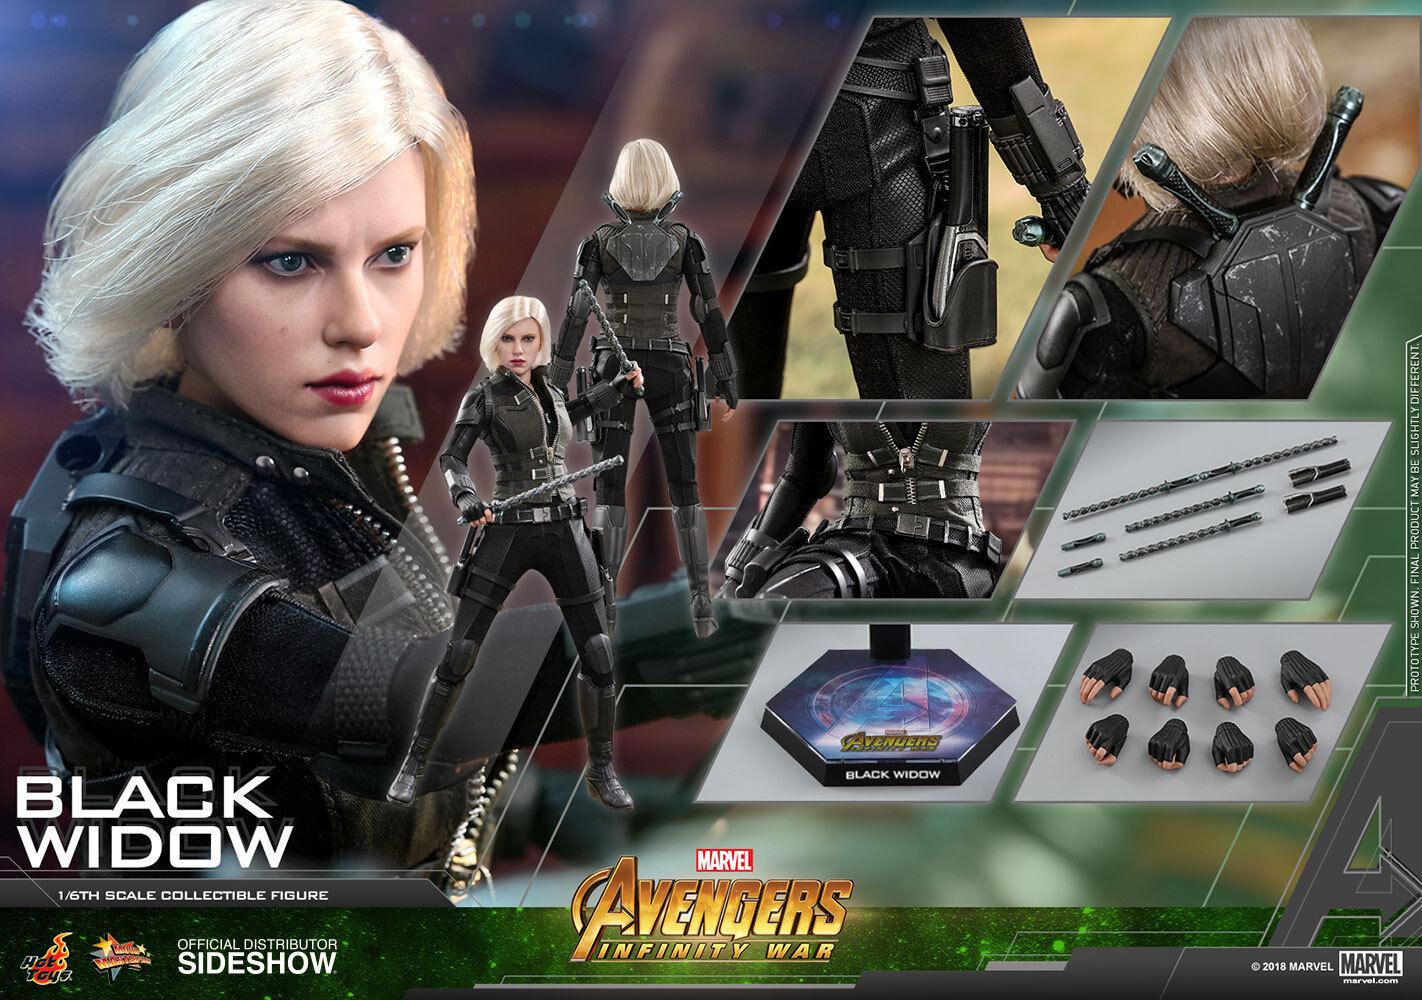 Hot Toys Black Widow Avengers Infinity War 1/6 Scale Figure